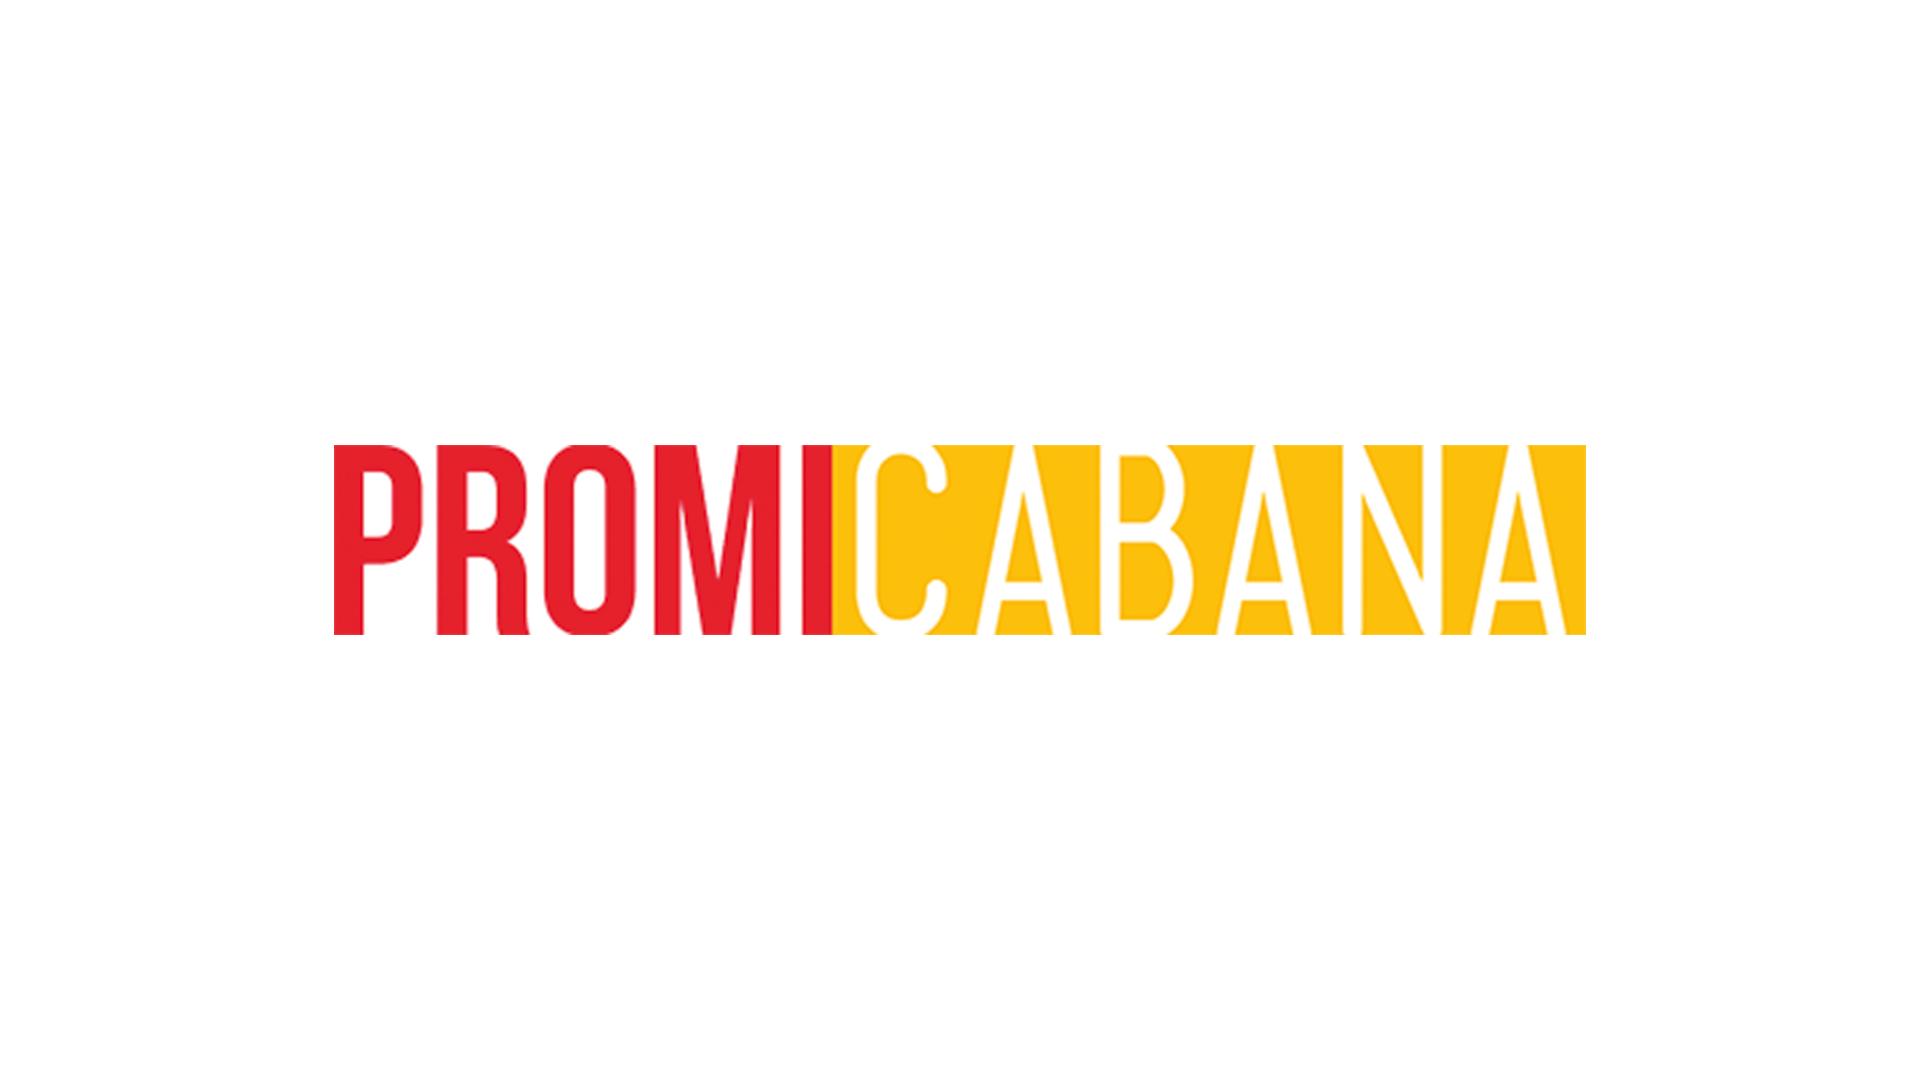 Ed-Sheeran-Britney-Spears-Cover-107.5